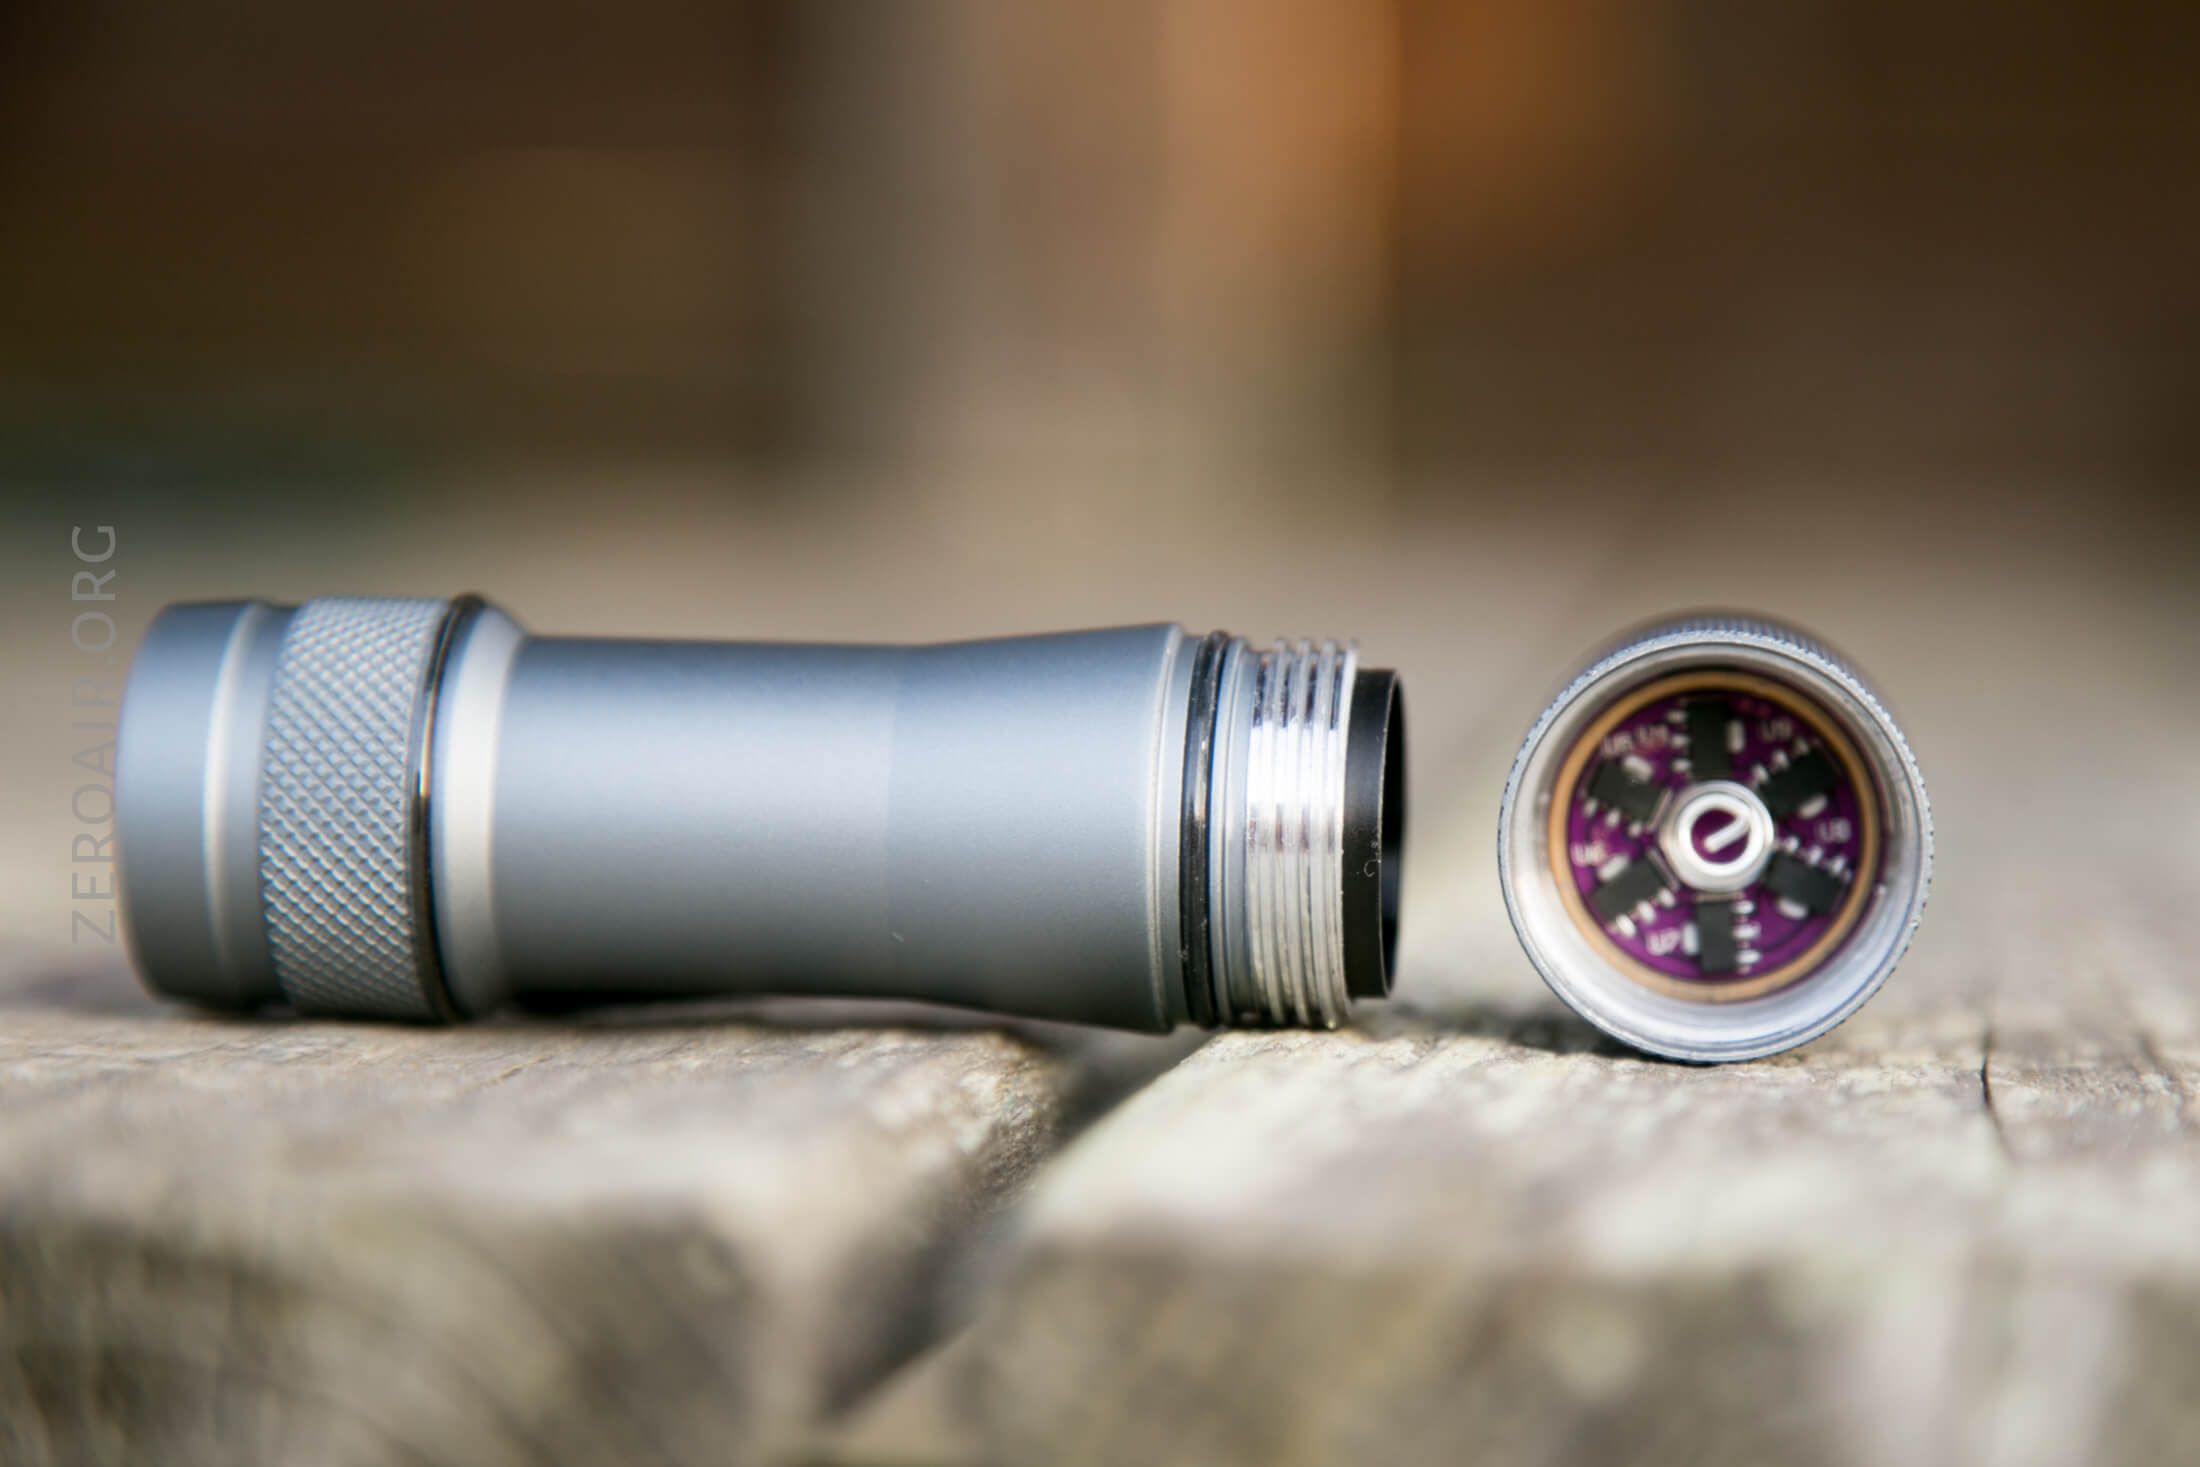 Lumintop FW3A Flashlight